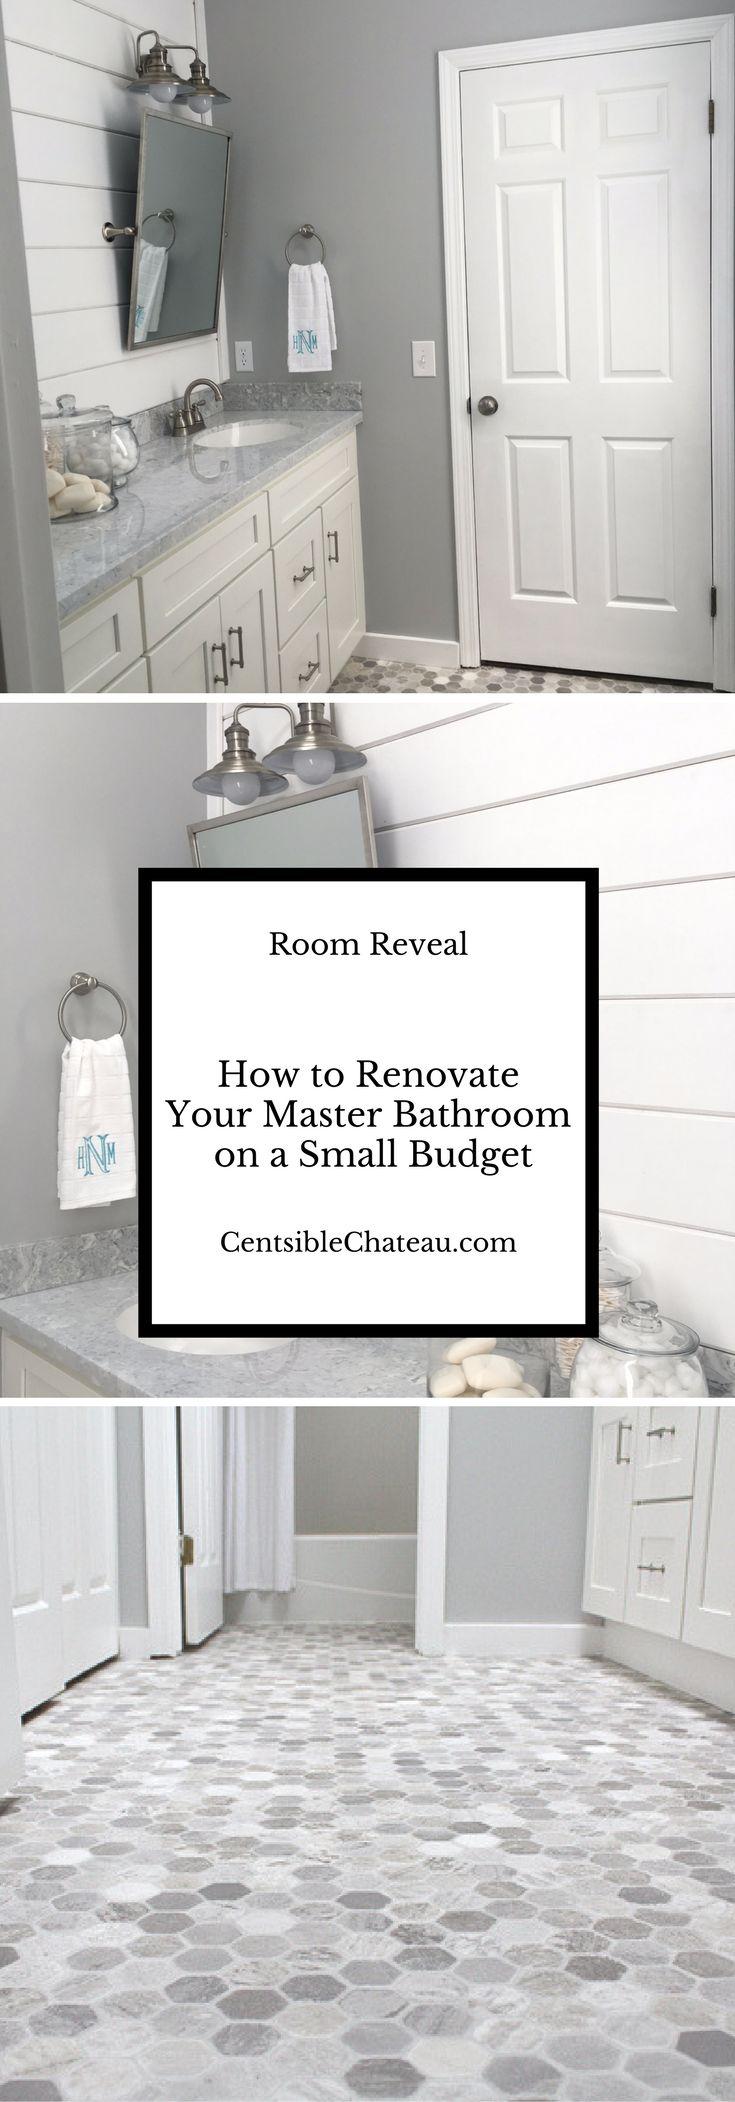 Bathroom Remodel|Master Bathroom|Bathroom Renovation|Bathroom decor|Bathroom Flooring